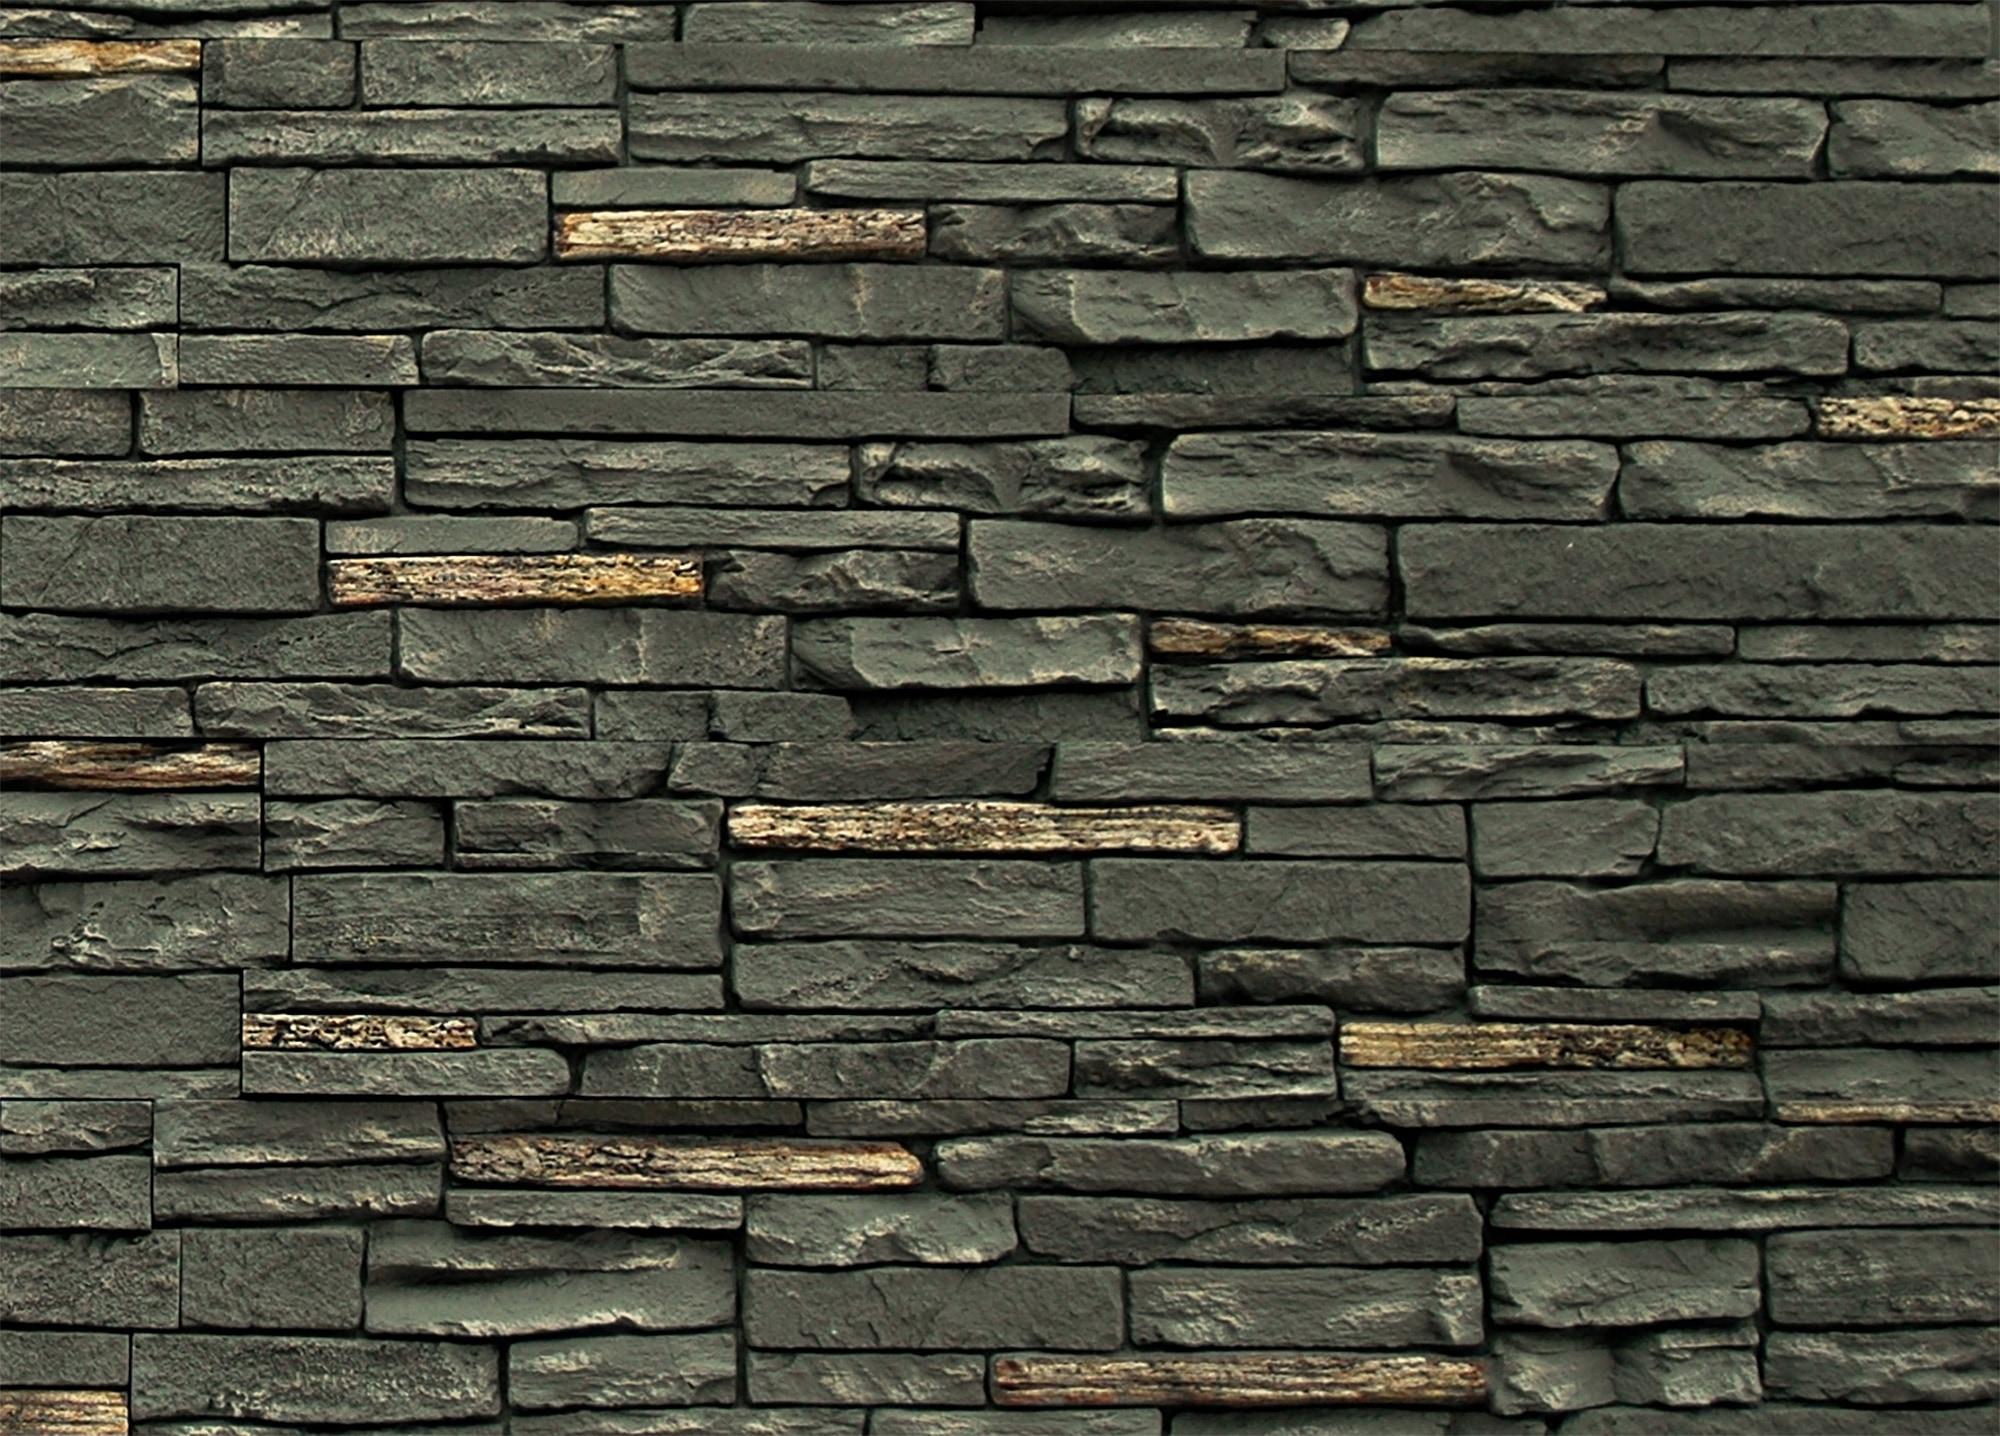 Twighlight / 17.12 Sq ft Flat StoneWorks Faux Stone Siding - Slate Stone 0